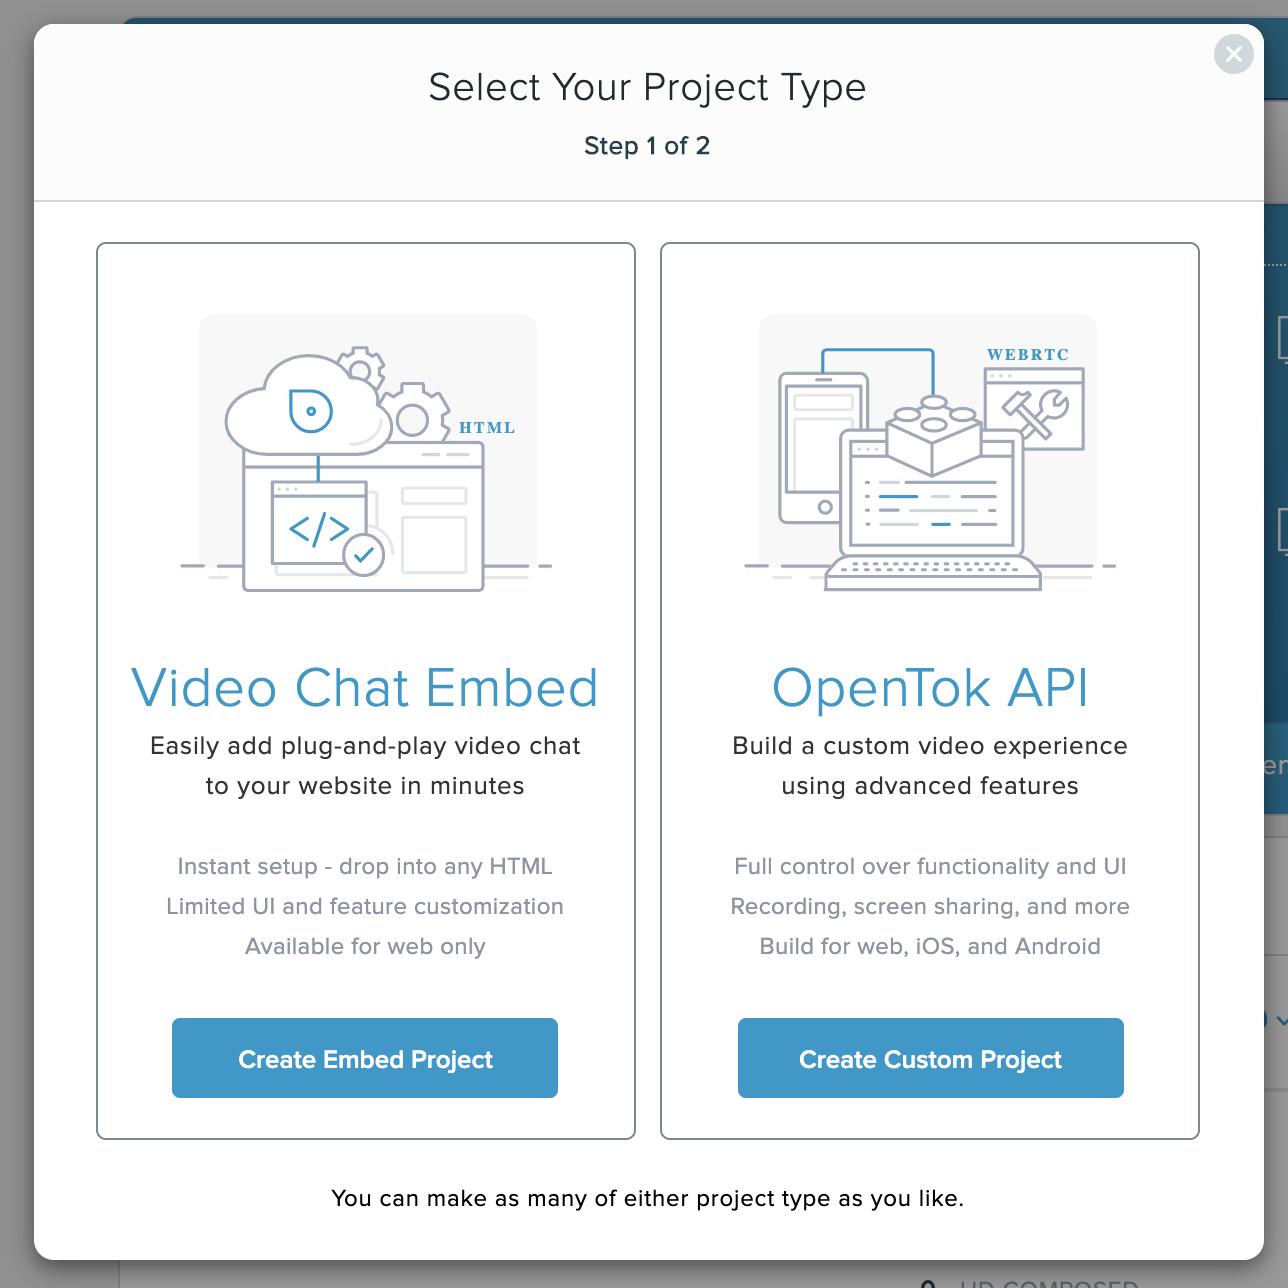 OpenTok Project types